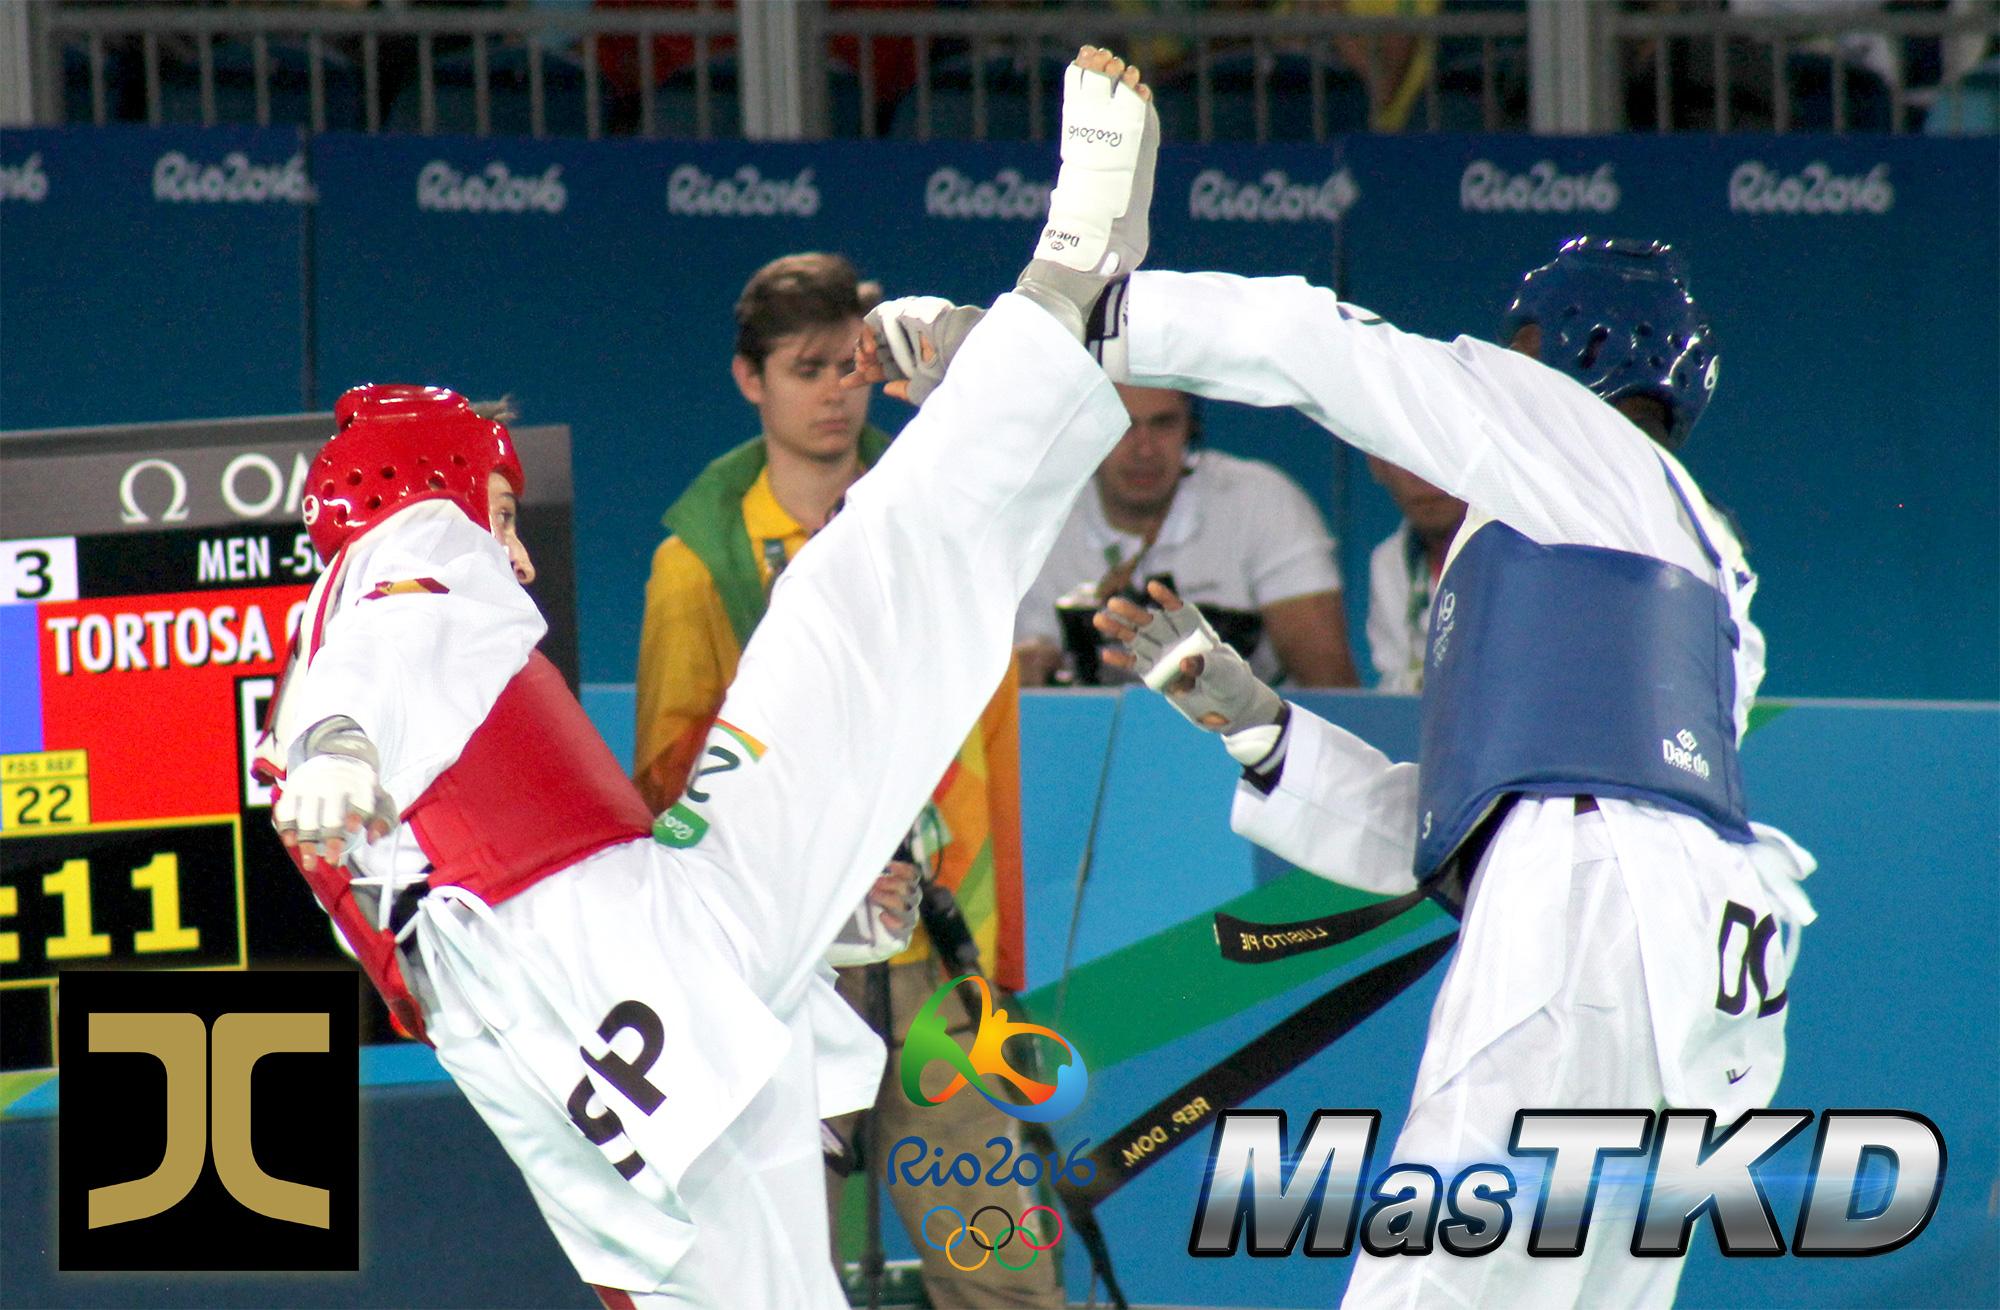 20160817_Taekwondo_JC_masTKD_Rio2016_09